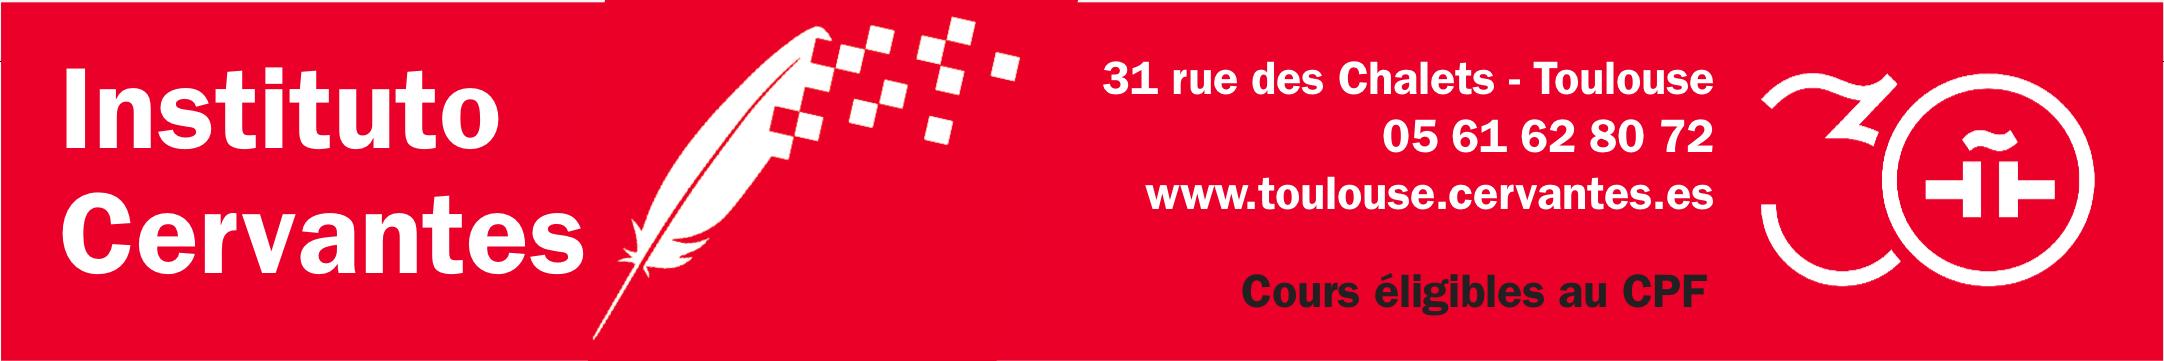 Cervantes Banniere Culture31 2021 3